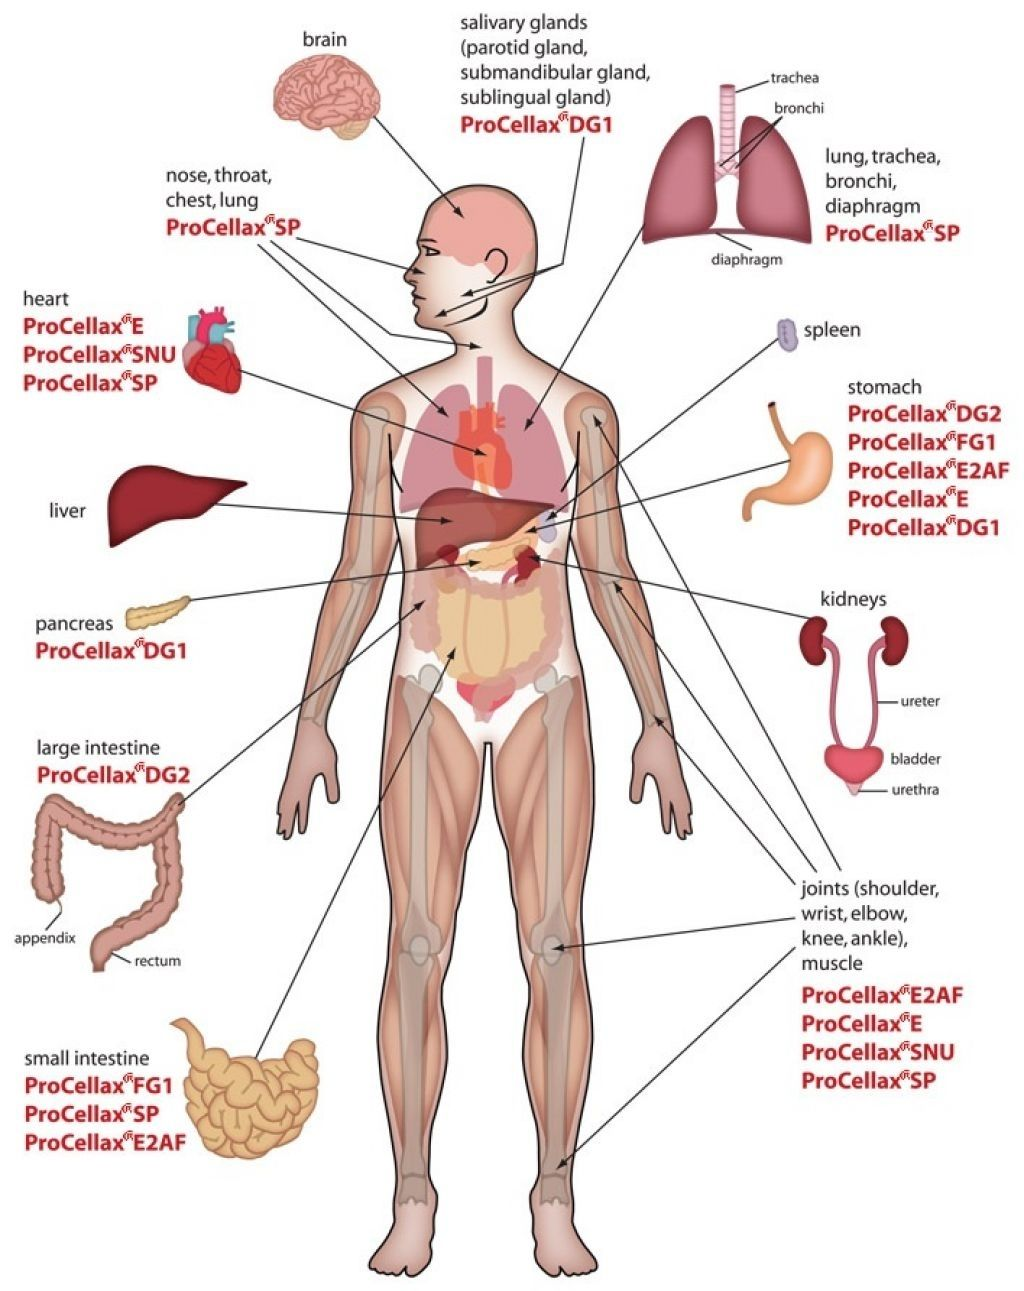 Excretory System Diagram Human Anatomy Drawing Human Body Organs